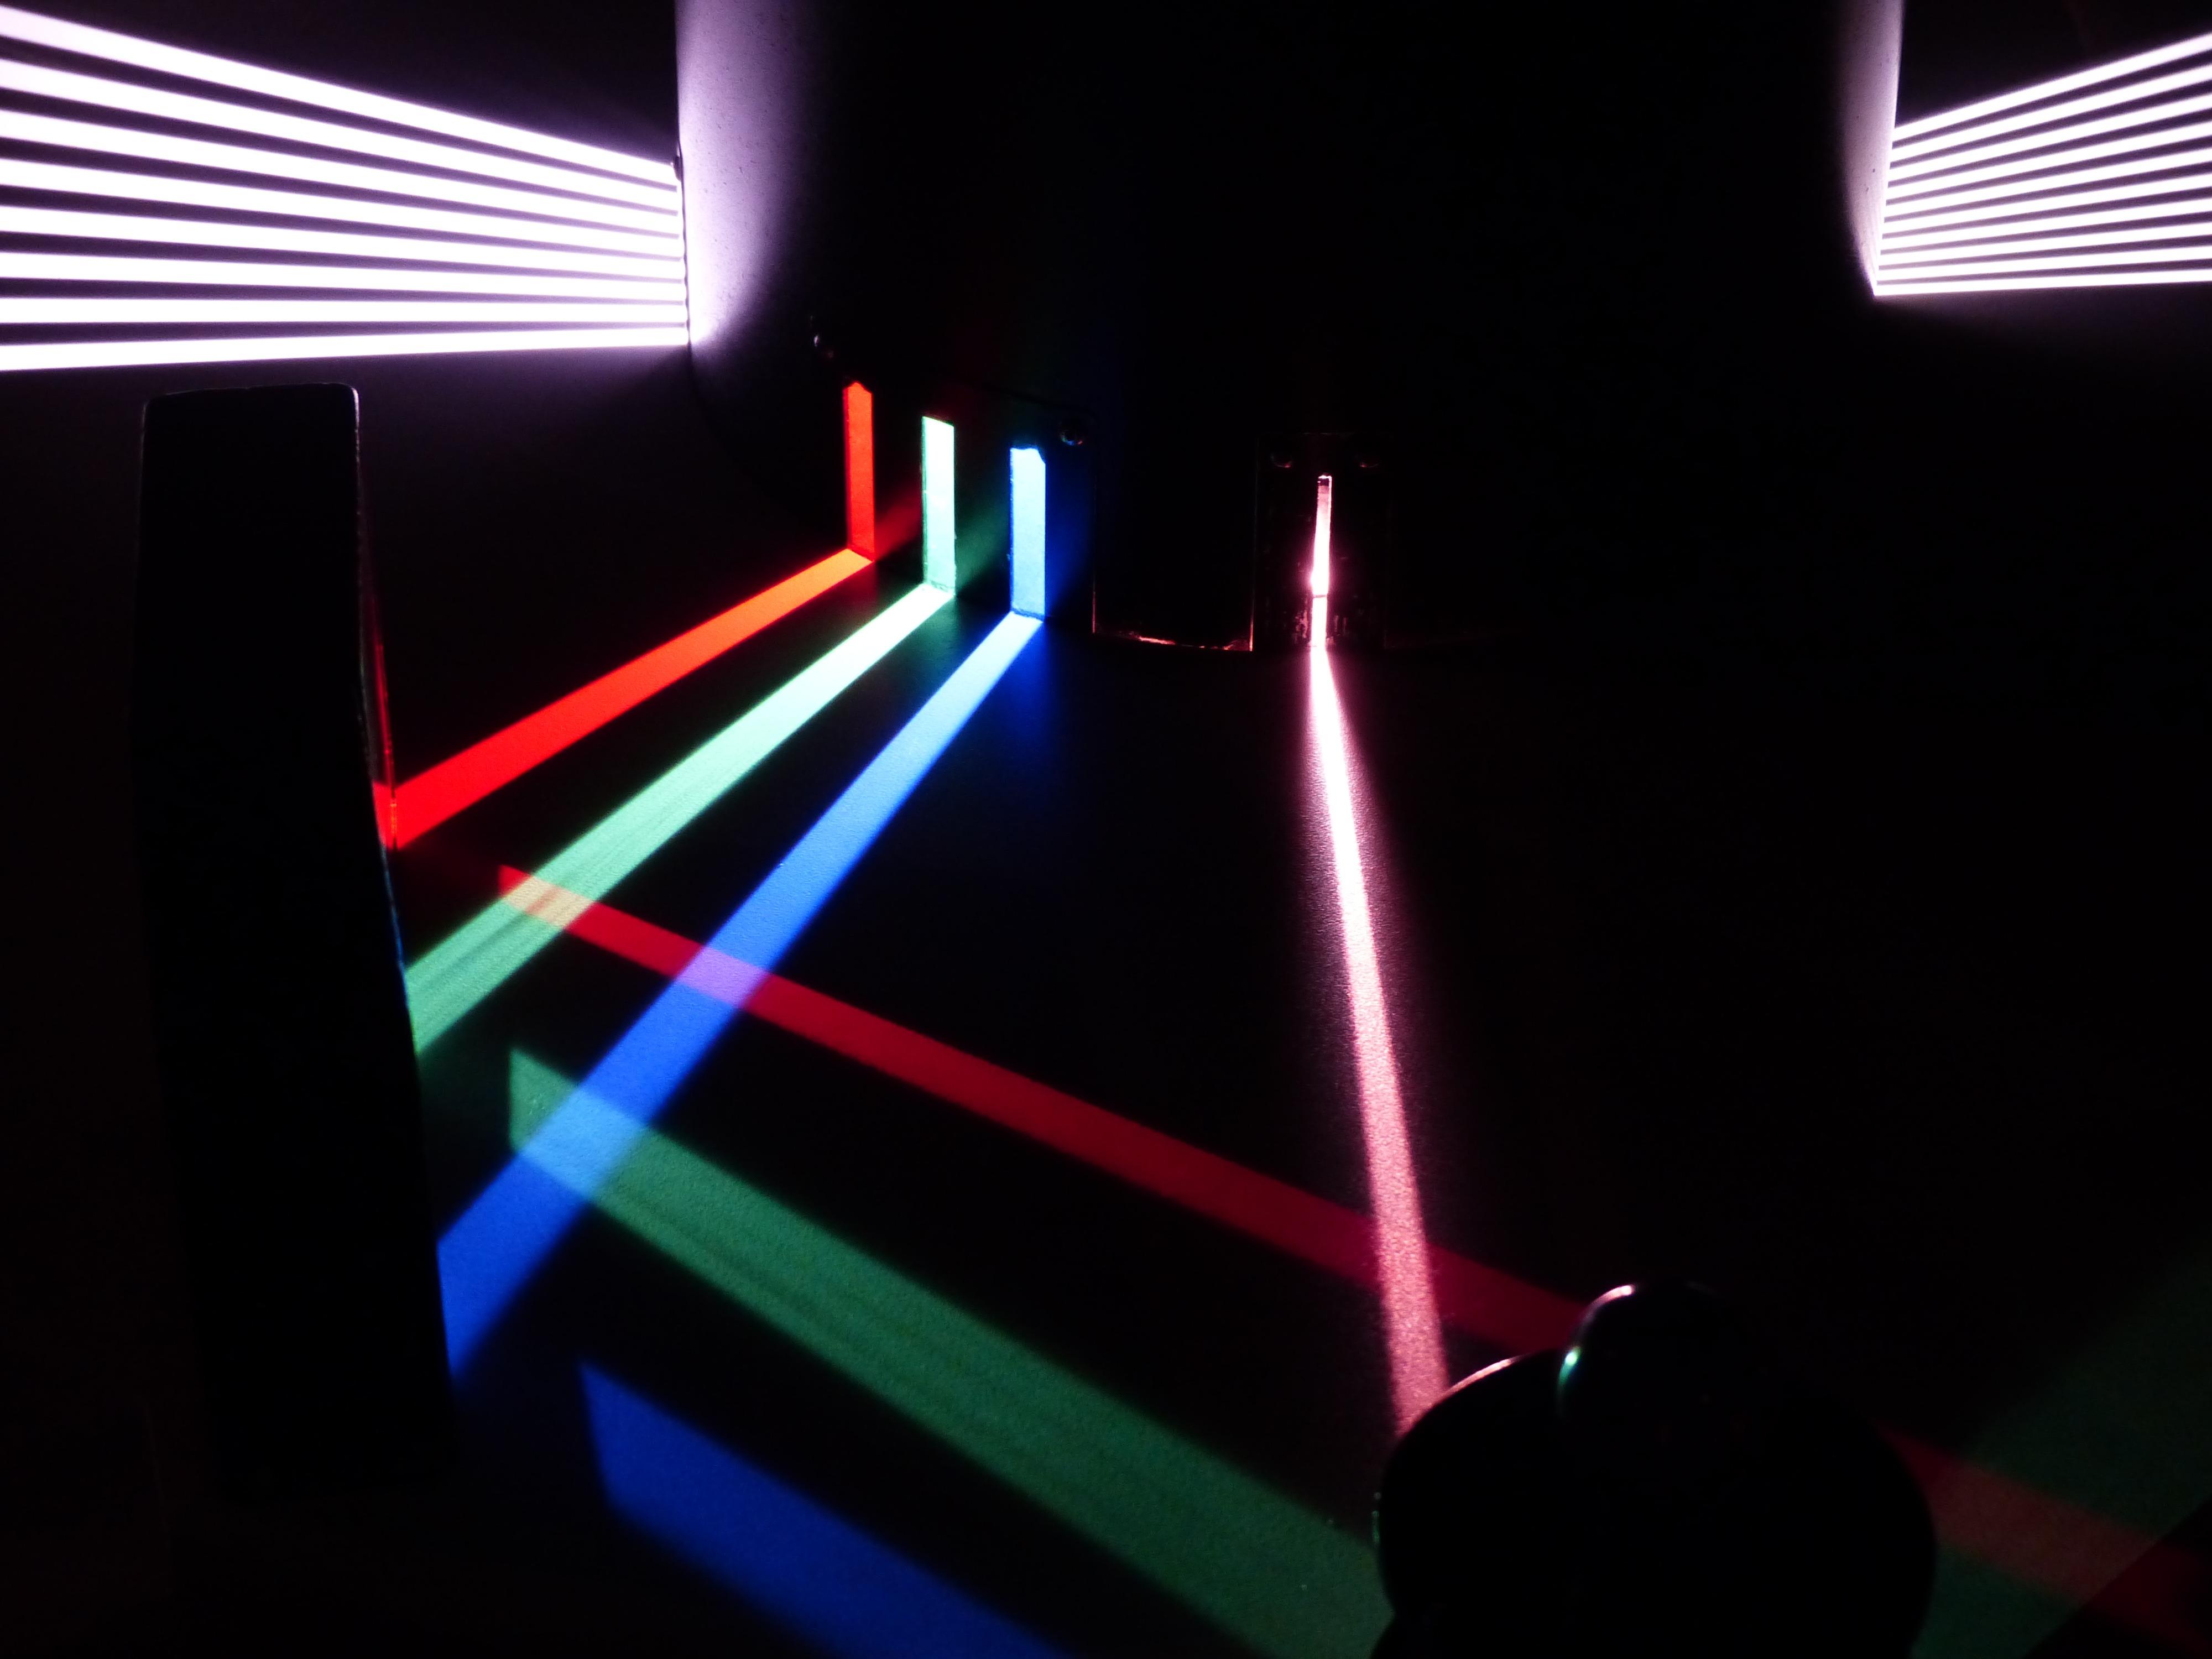 https://get.pxhere.com/photo/light-color-signage-lighting-optics-laser-neon-neon-sign-stage-mirror-spectrum-light-beam-shape-experiment-disco-physics-attempt-prism-nightclub-rainbow-colors-light-spectrum-redirection-experimental-physics-light-guide-1125972.jpg